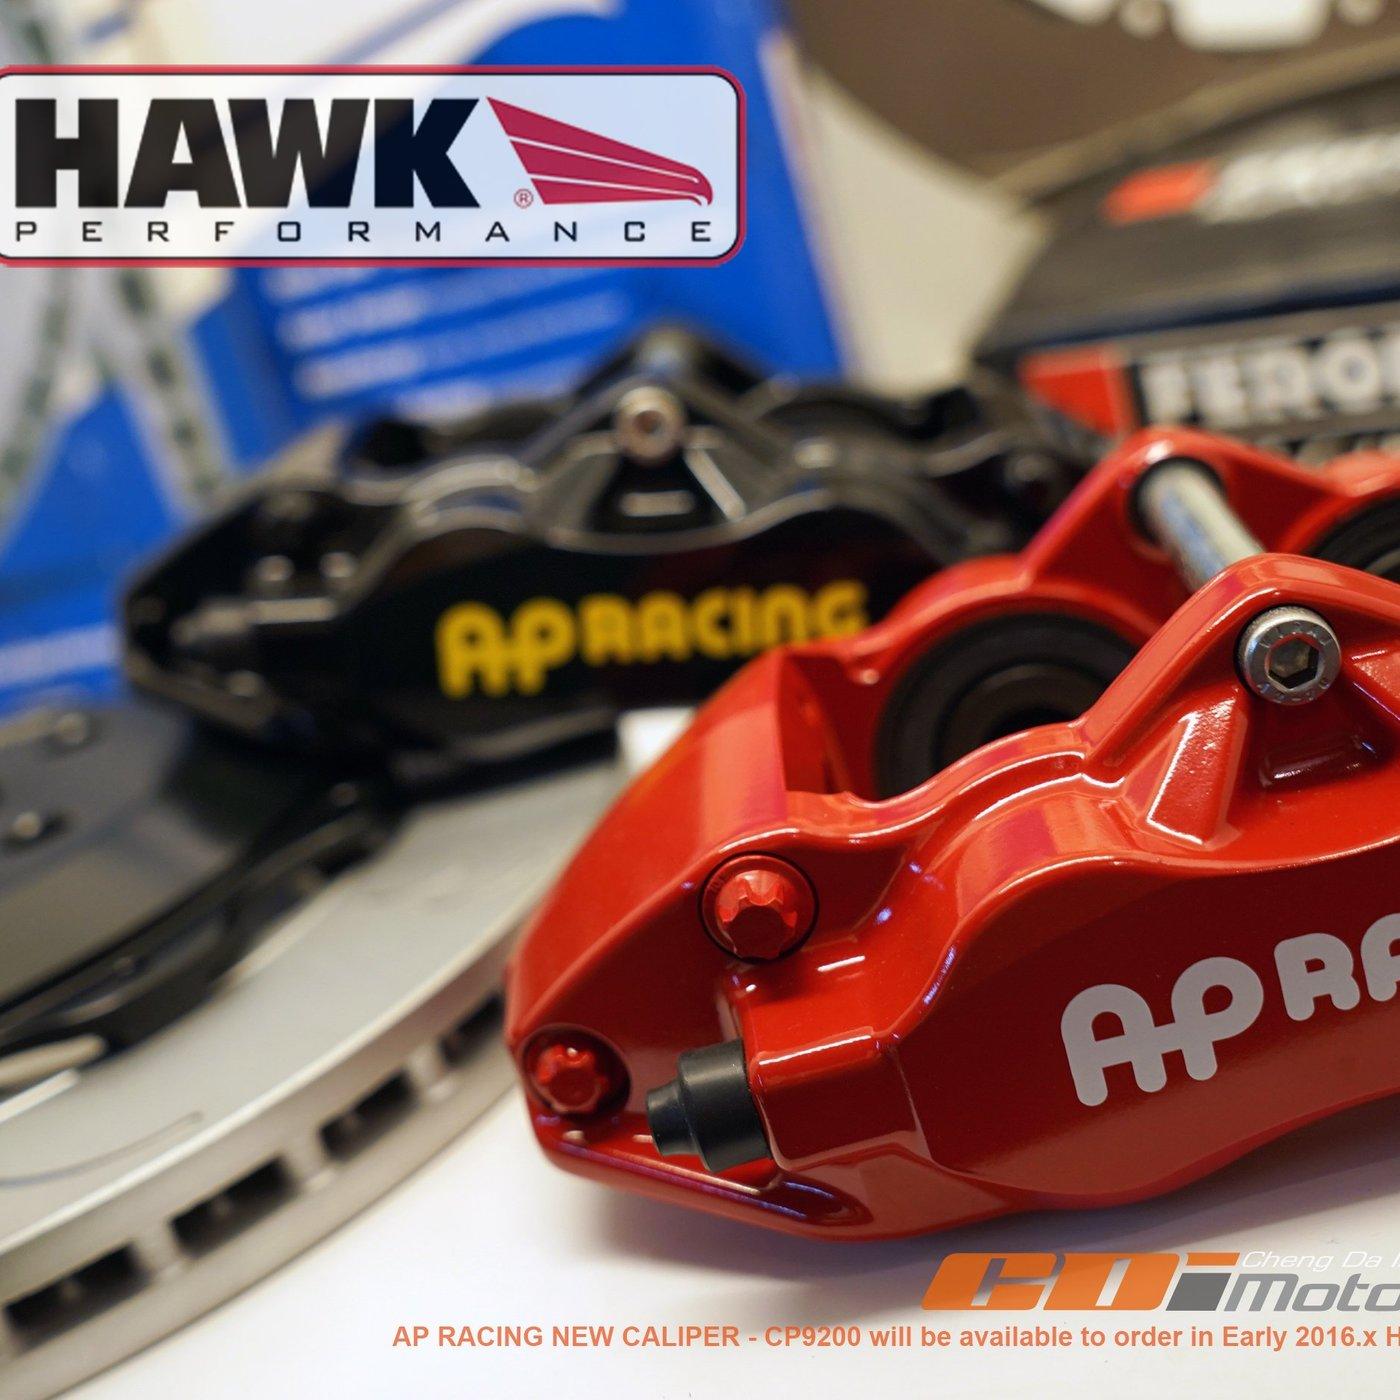 AP RACING CP-9200(紅) 四活塞組+原裝HAKW 330x28mm碟盤組完整